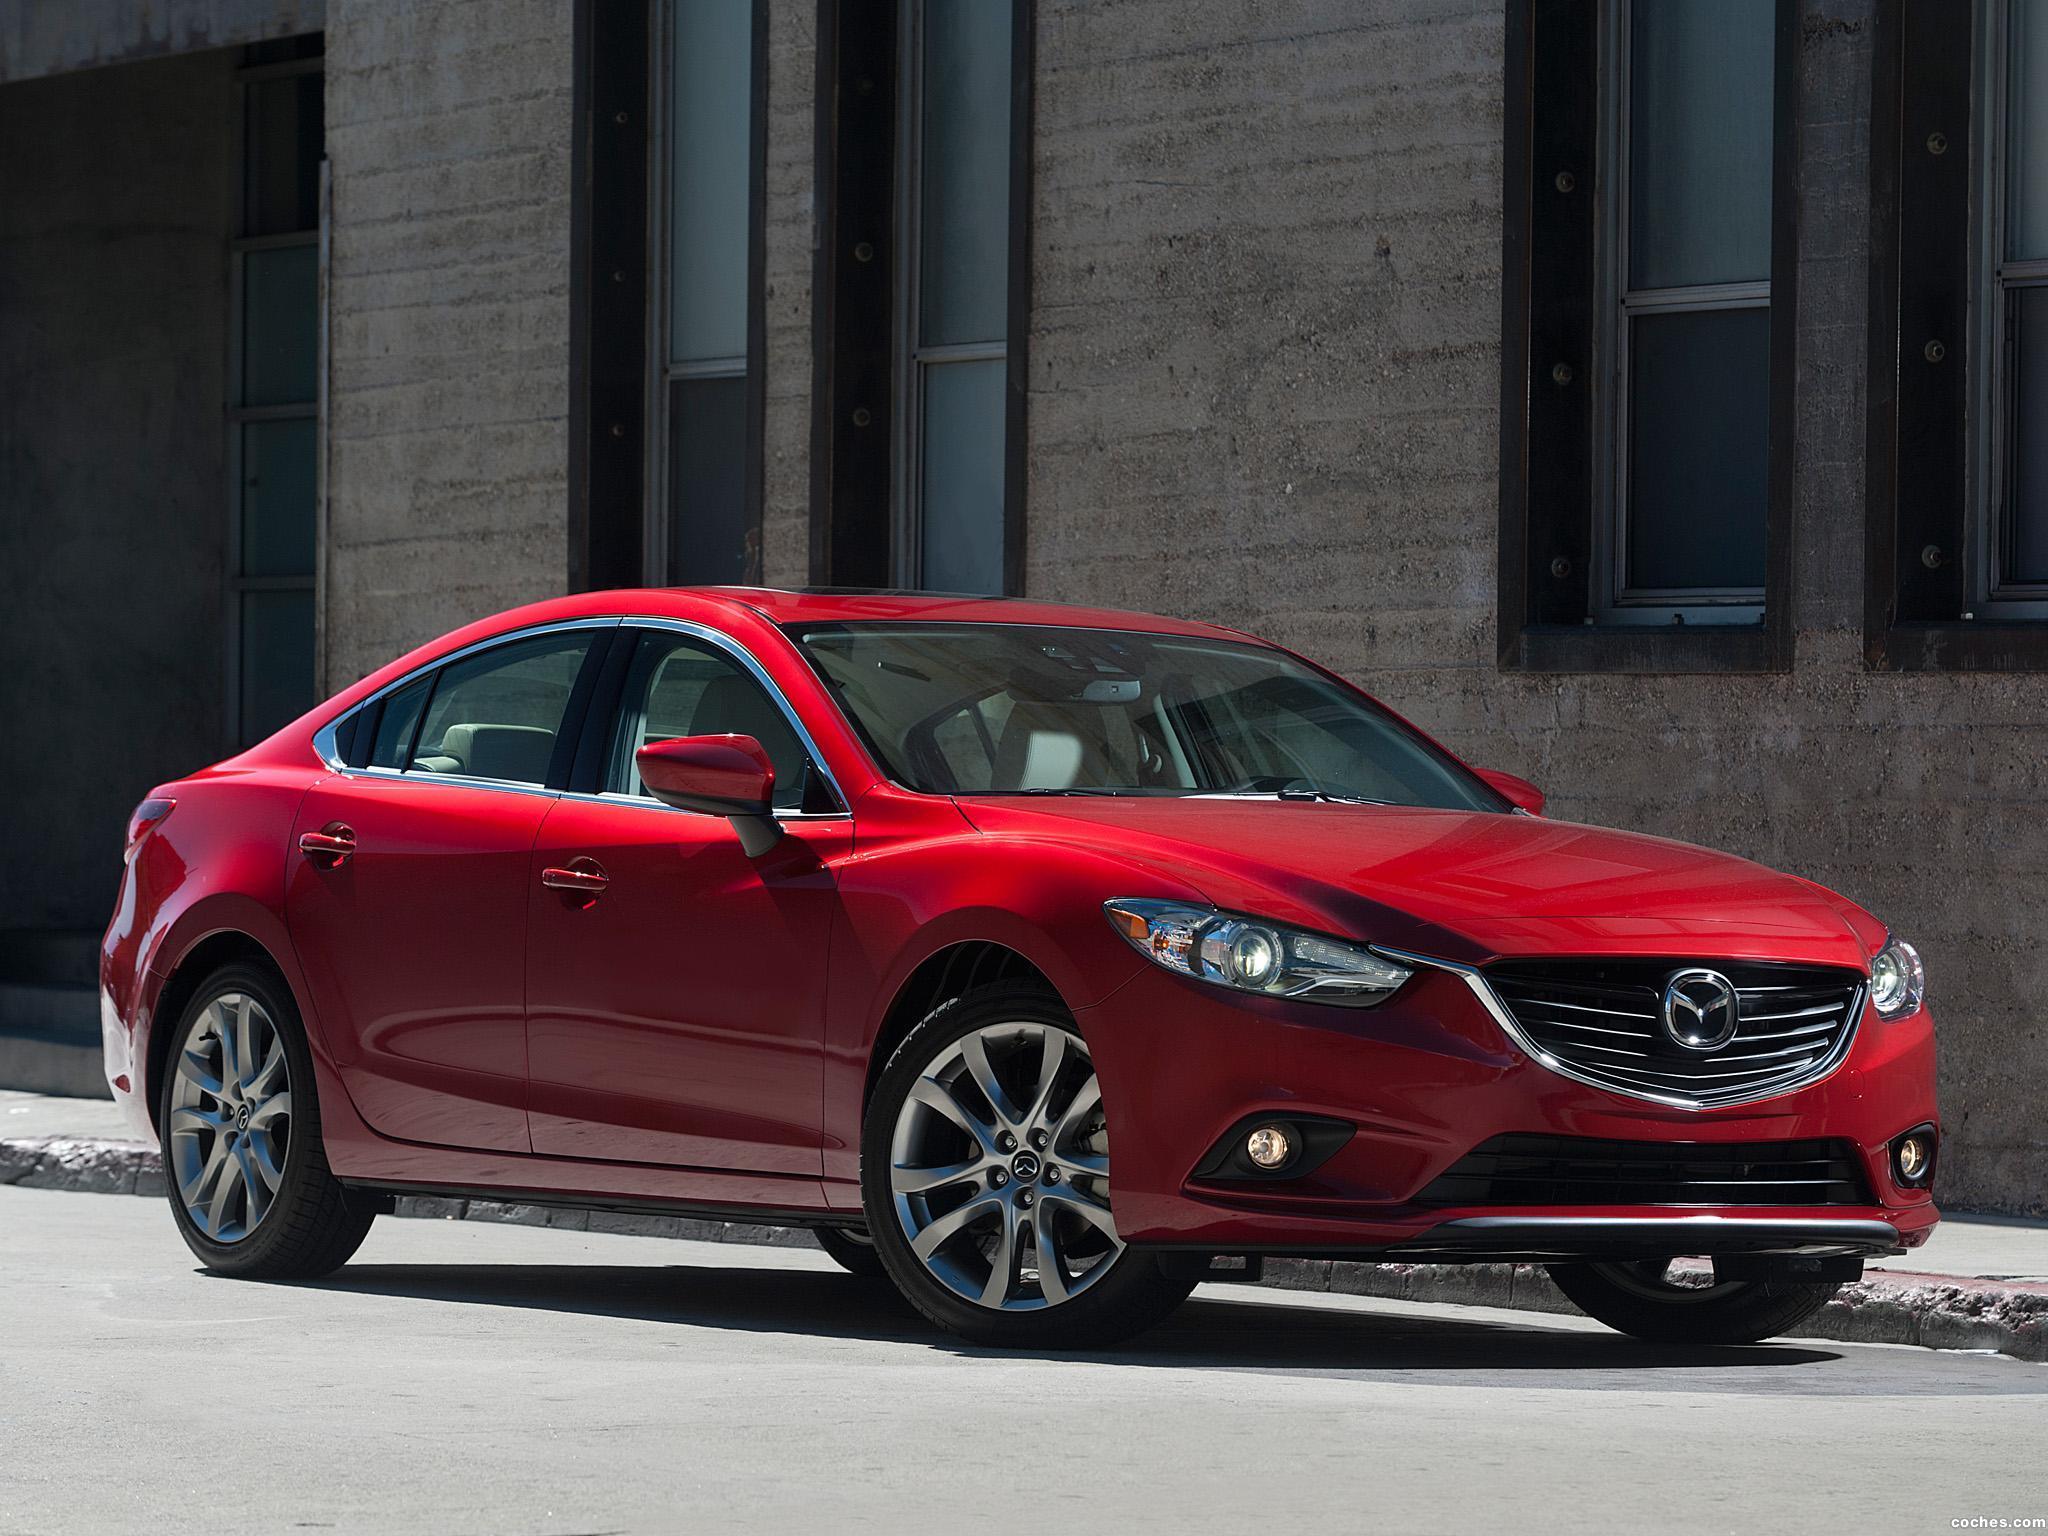 Foto 17 de Mazda 6 USA 2013